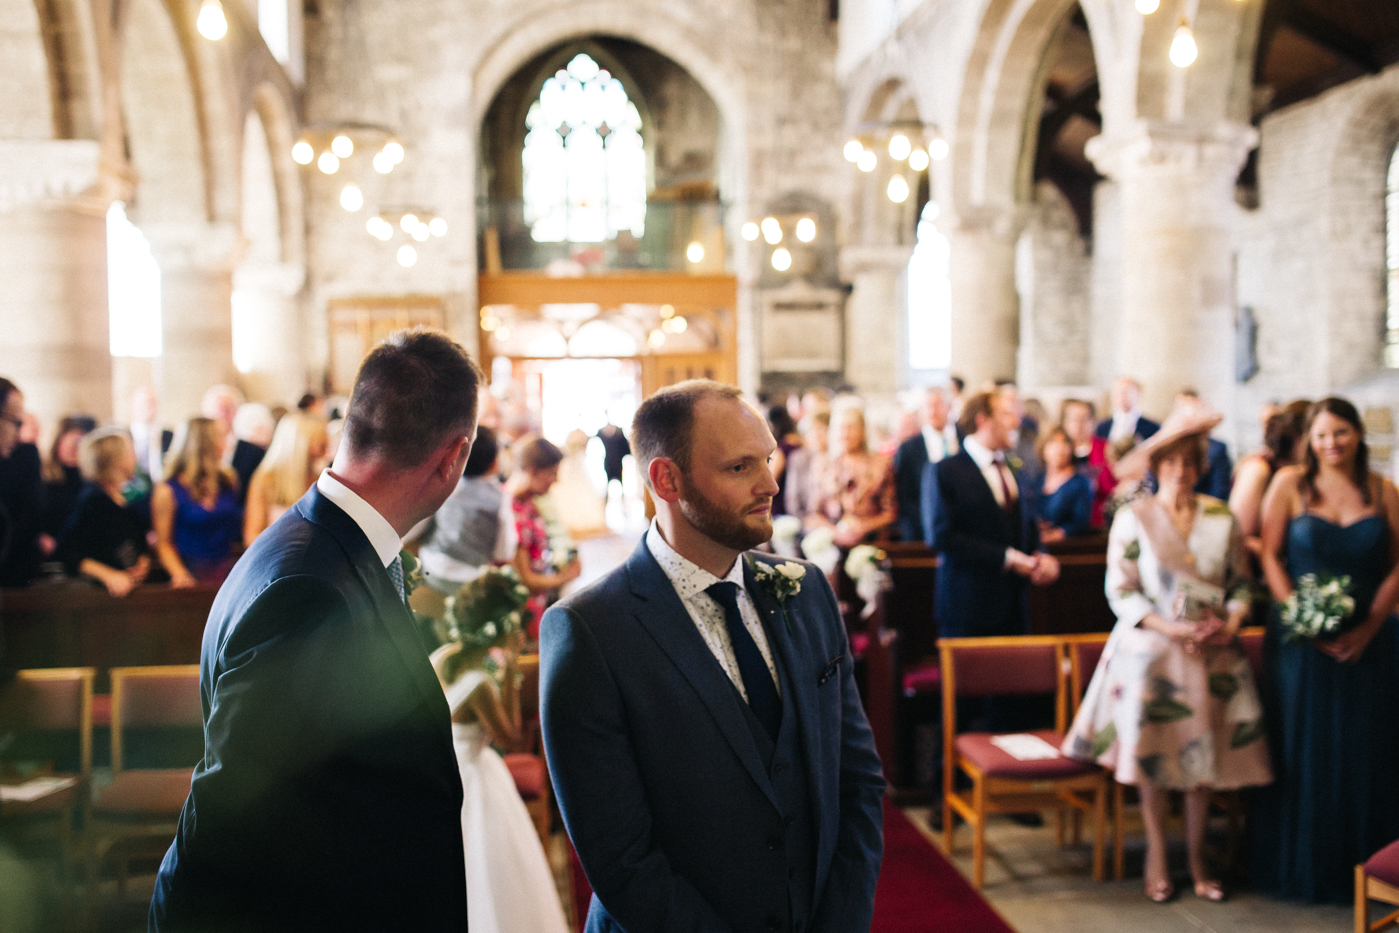 york-house-malton-wedding-photographer-north-yorkshire-0015.jpg